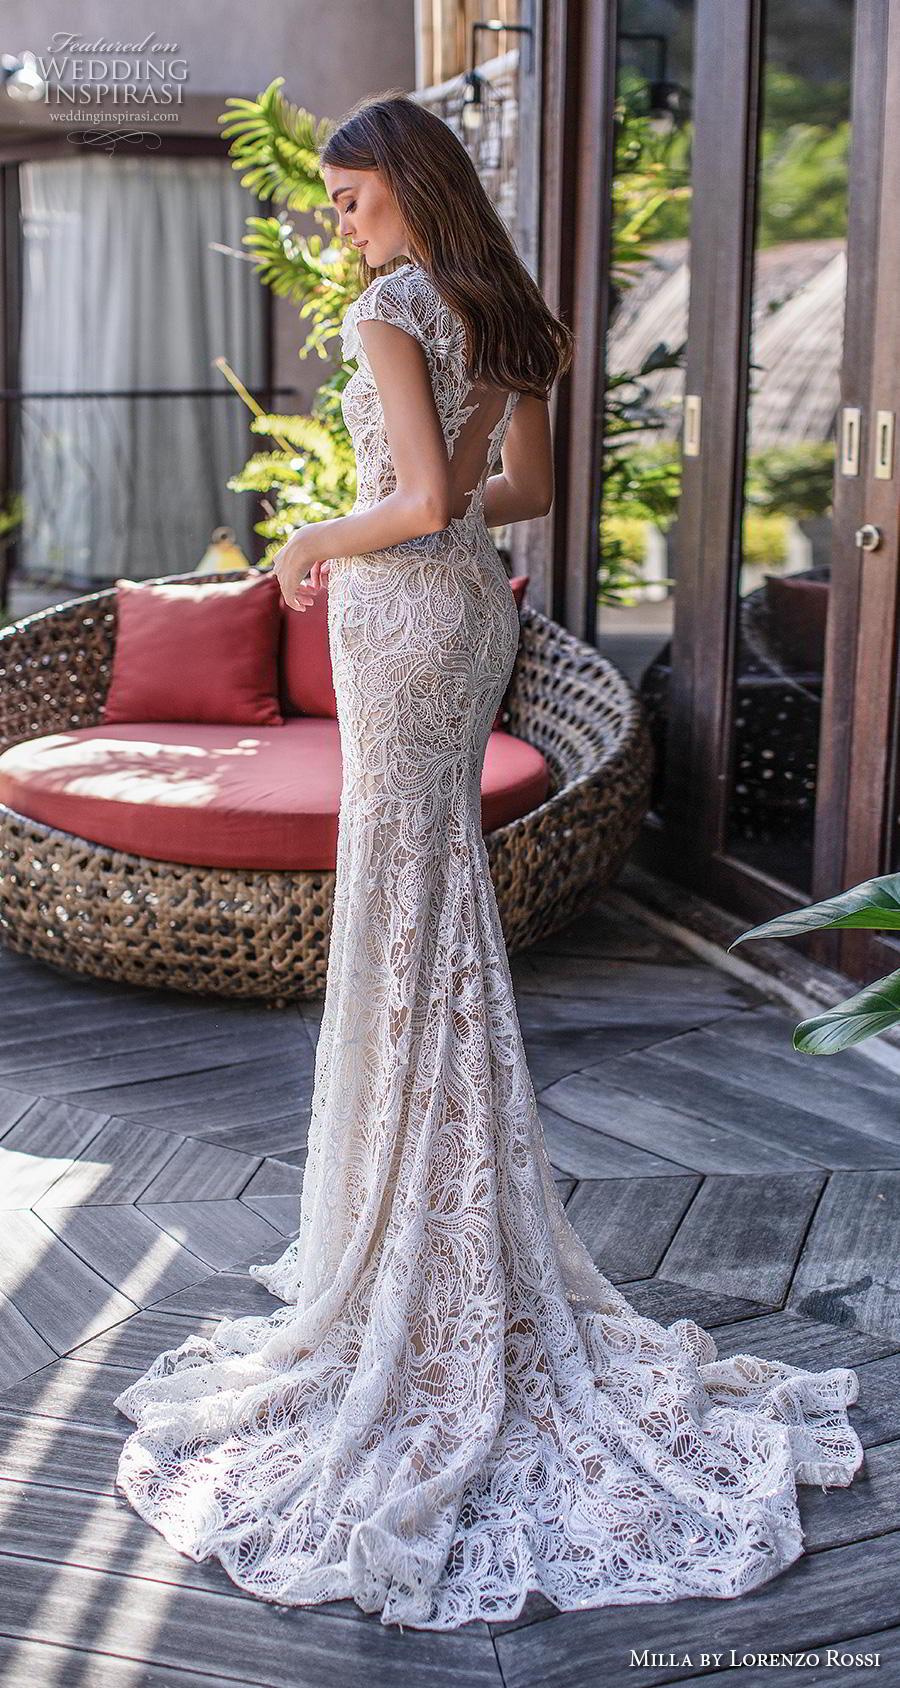 lorenzo rossi 2019 milla bridal cap sleeves jewel neck full embellishment elegant fit and flare sheath wedding dress keyhole back short train (12) bv